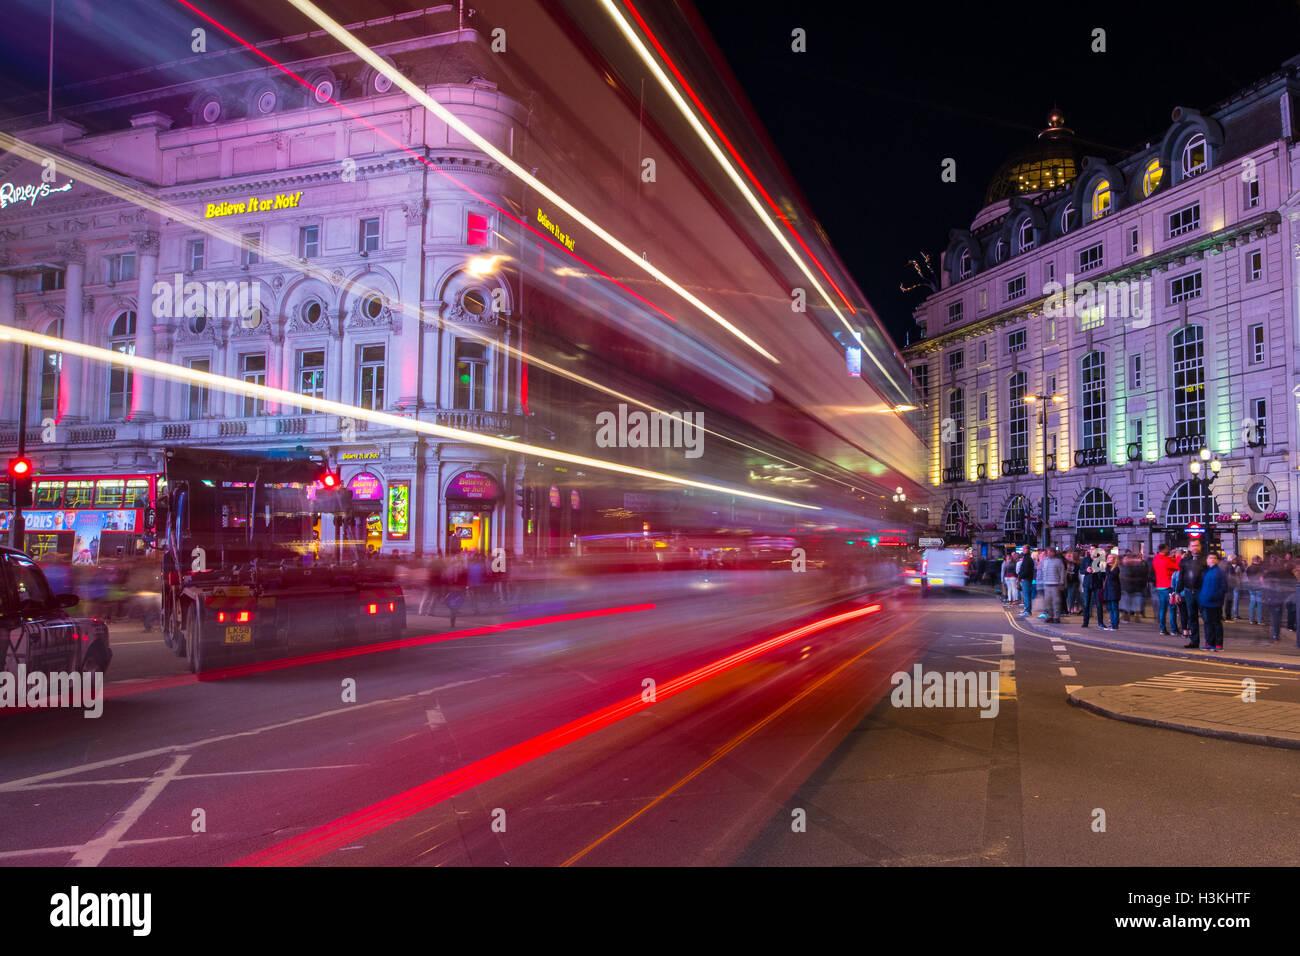 Light Trail Trails am Londoner Piccadilly Circus Stockbild